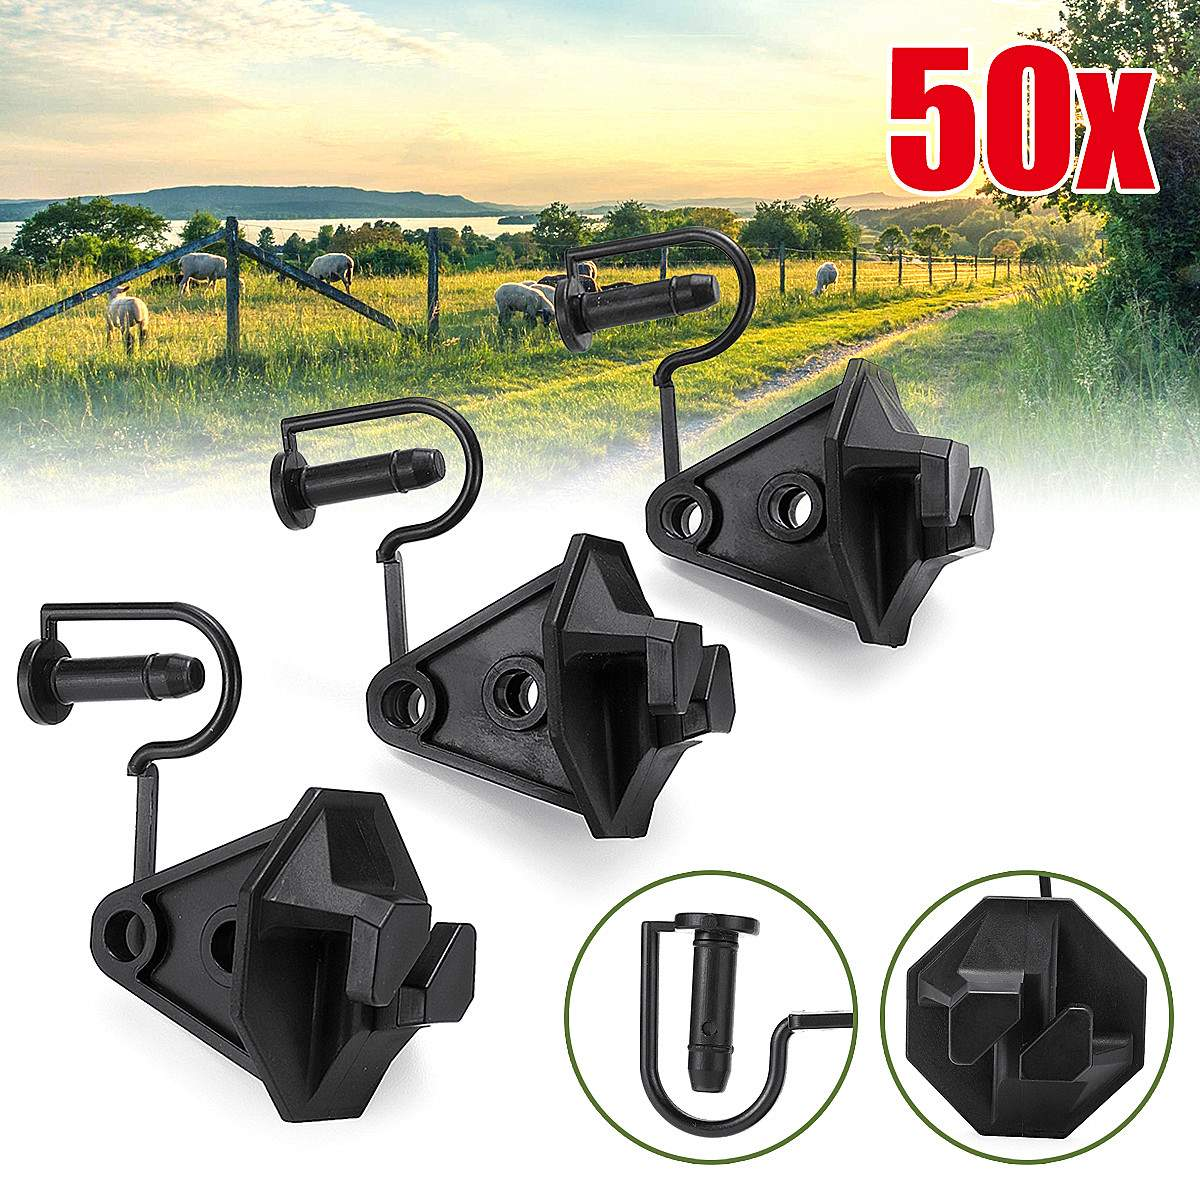 50pcs 1.6'' Electric Fence Insulator Pinlock Pin Lock Insulators Steel Post